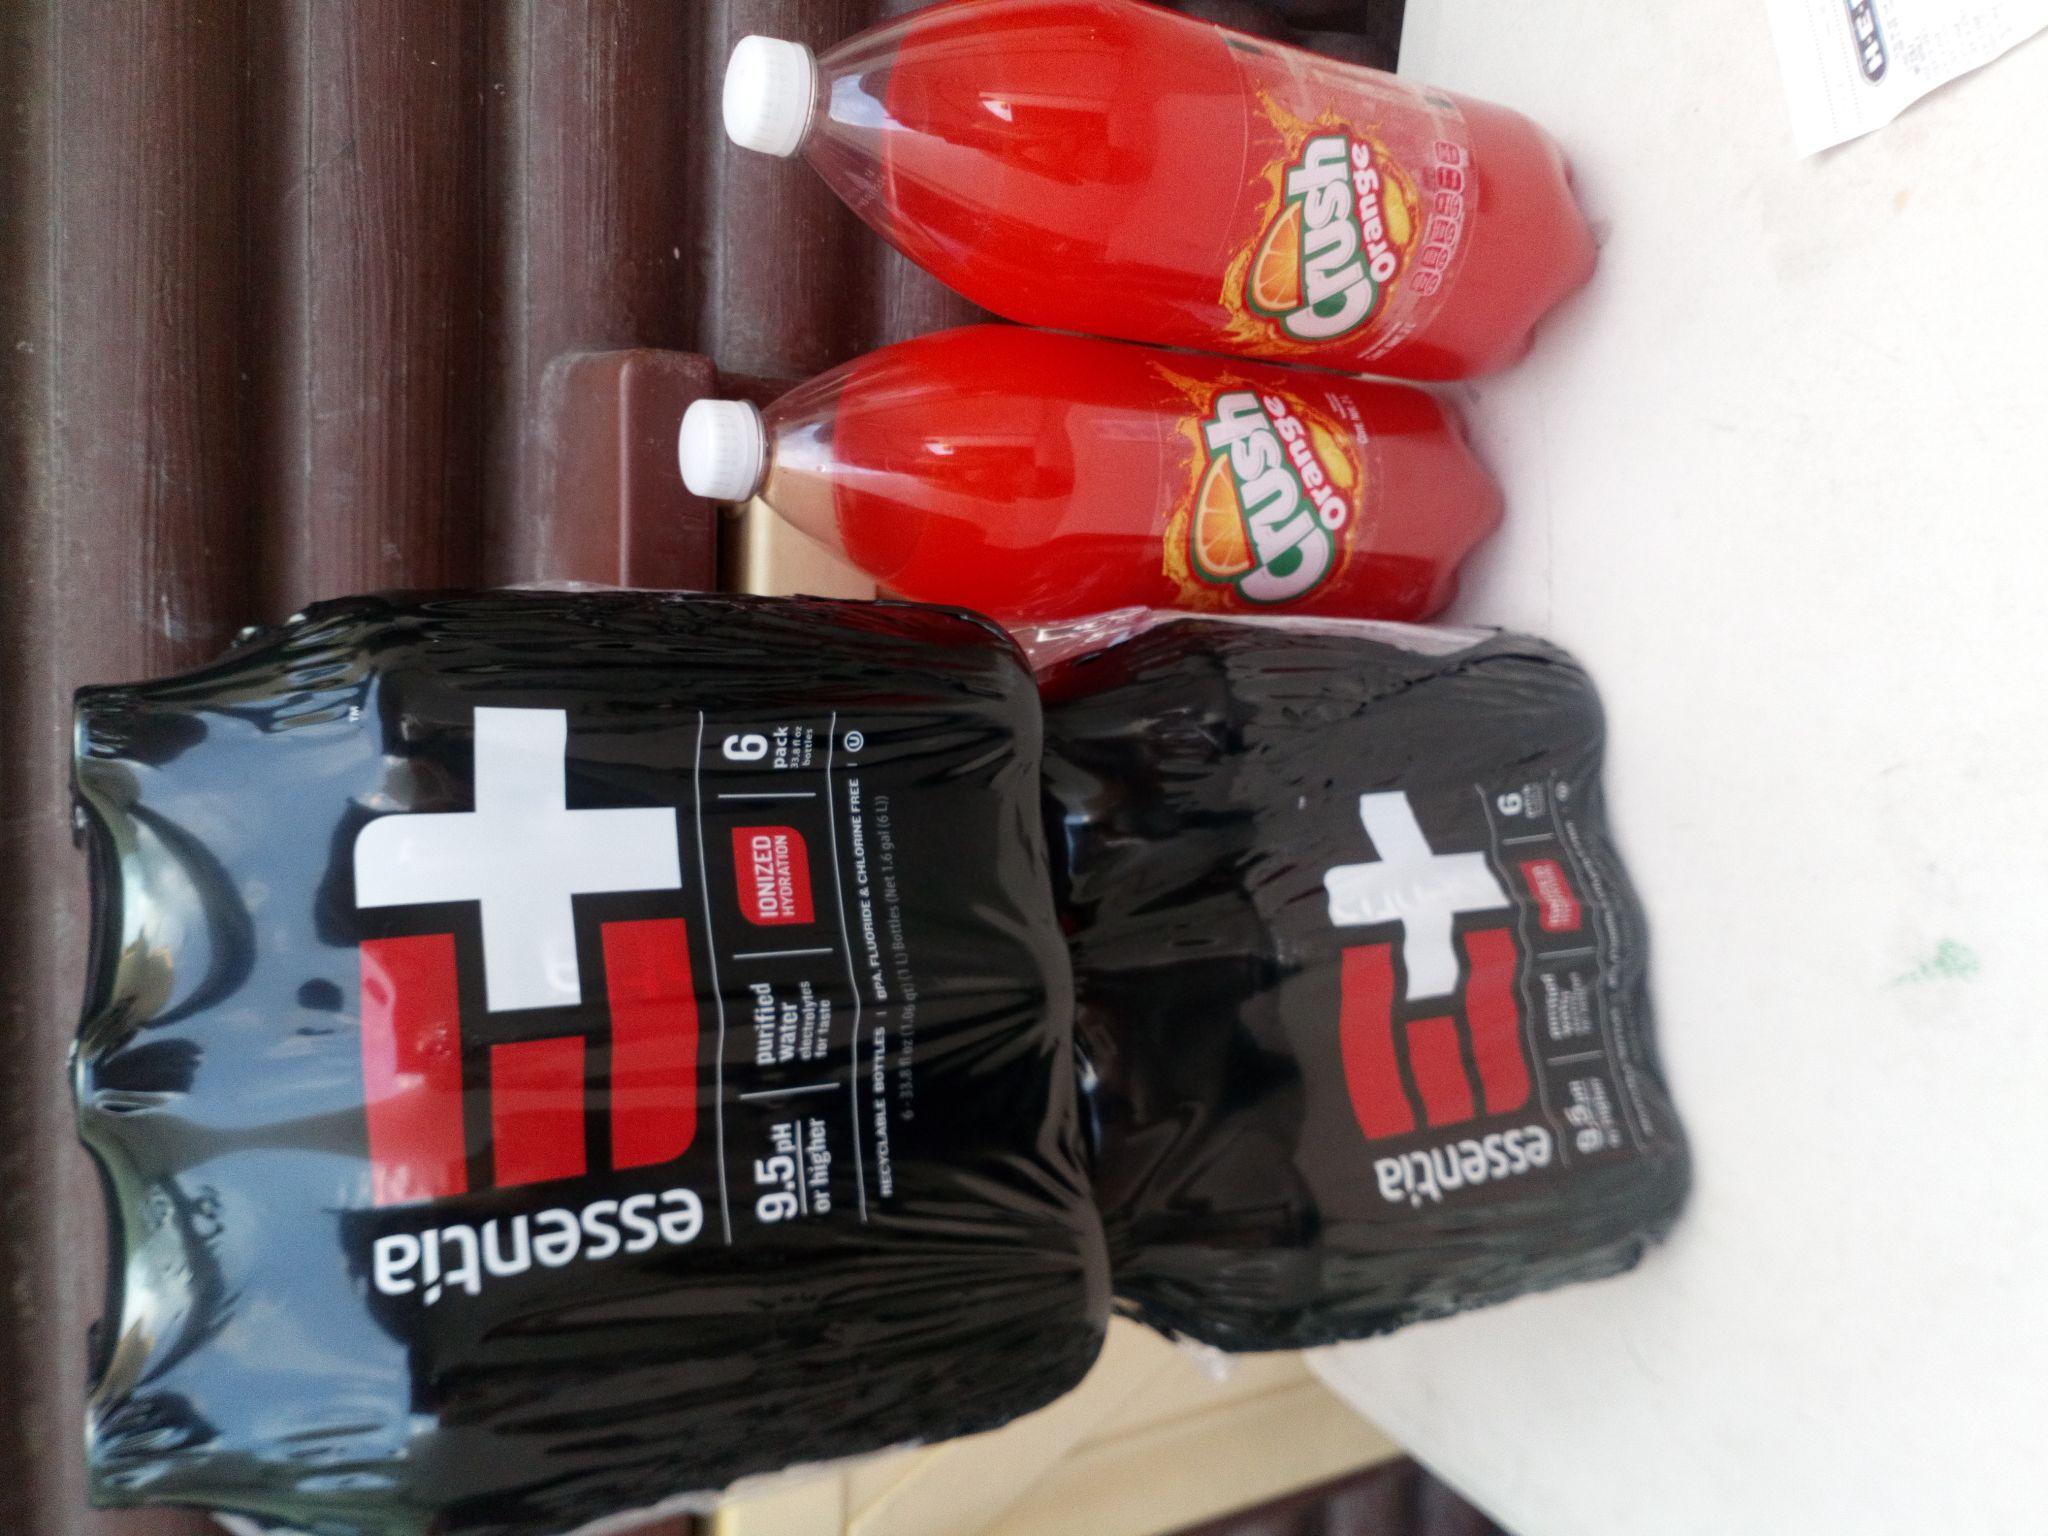 HEB: combo loco comprando 2 refrescos de 2, 2.5 lts gratis dos paquetes de agua alcalina